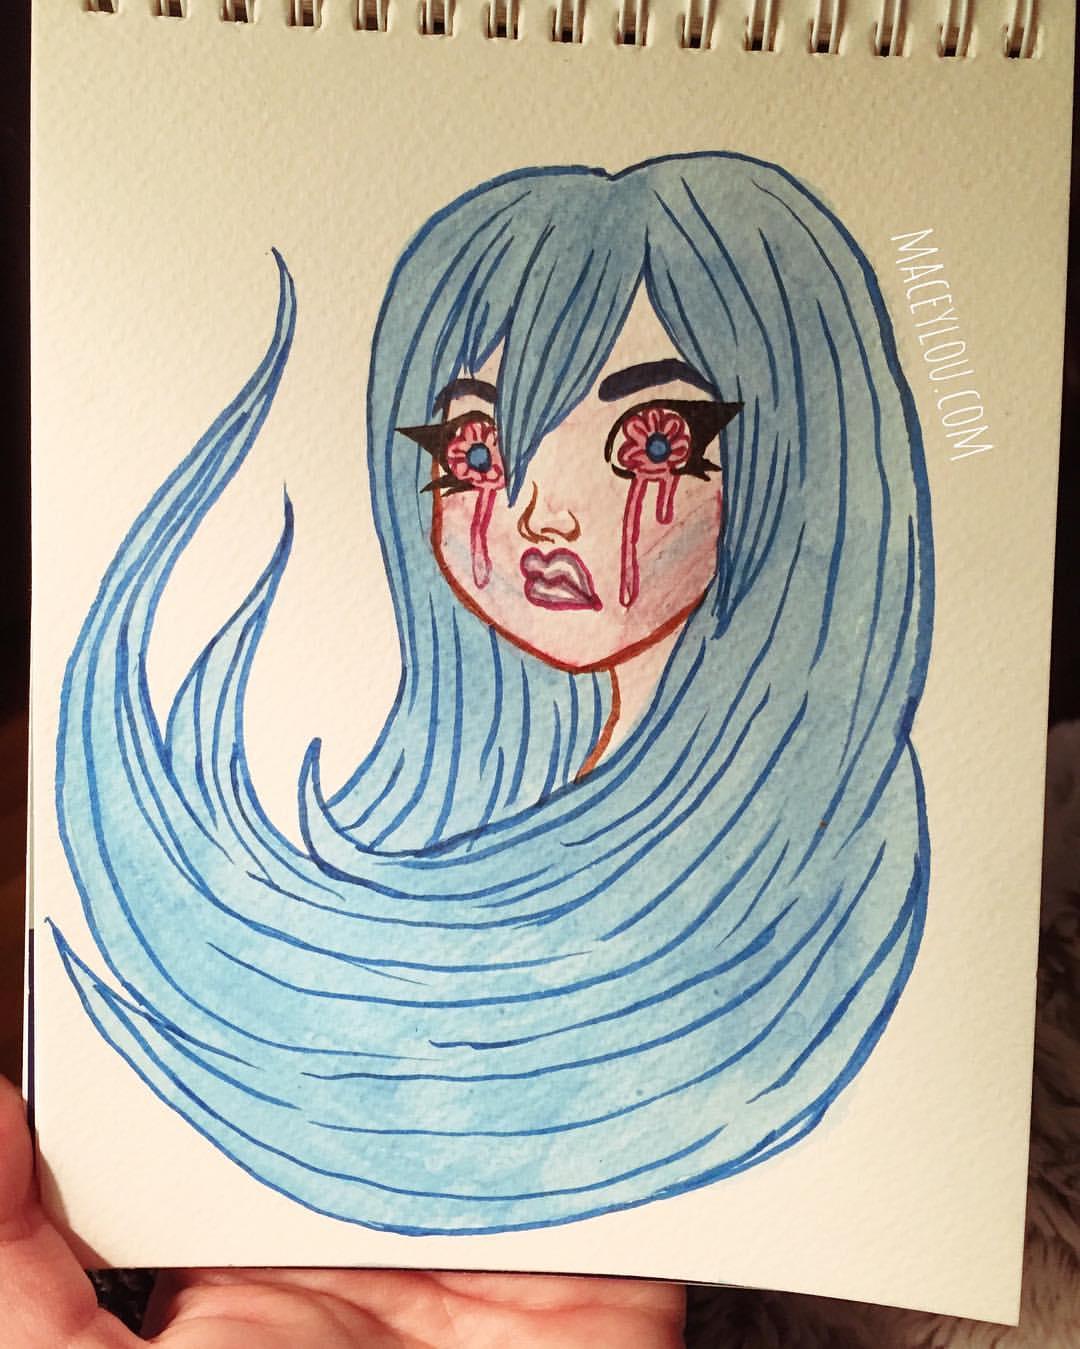 sad loss family tears crybaby cry baby crying girl kawaii cute pretty blue hair watercolor illustration painting.jpg